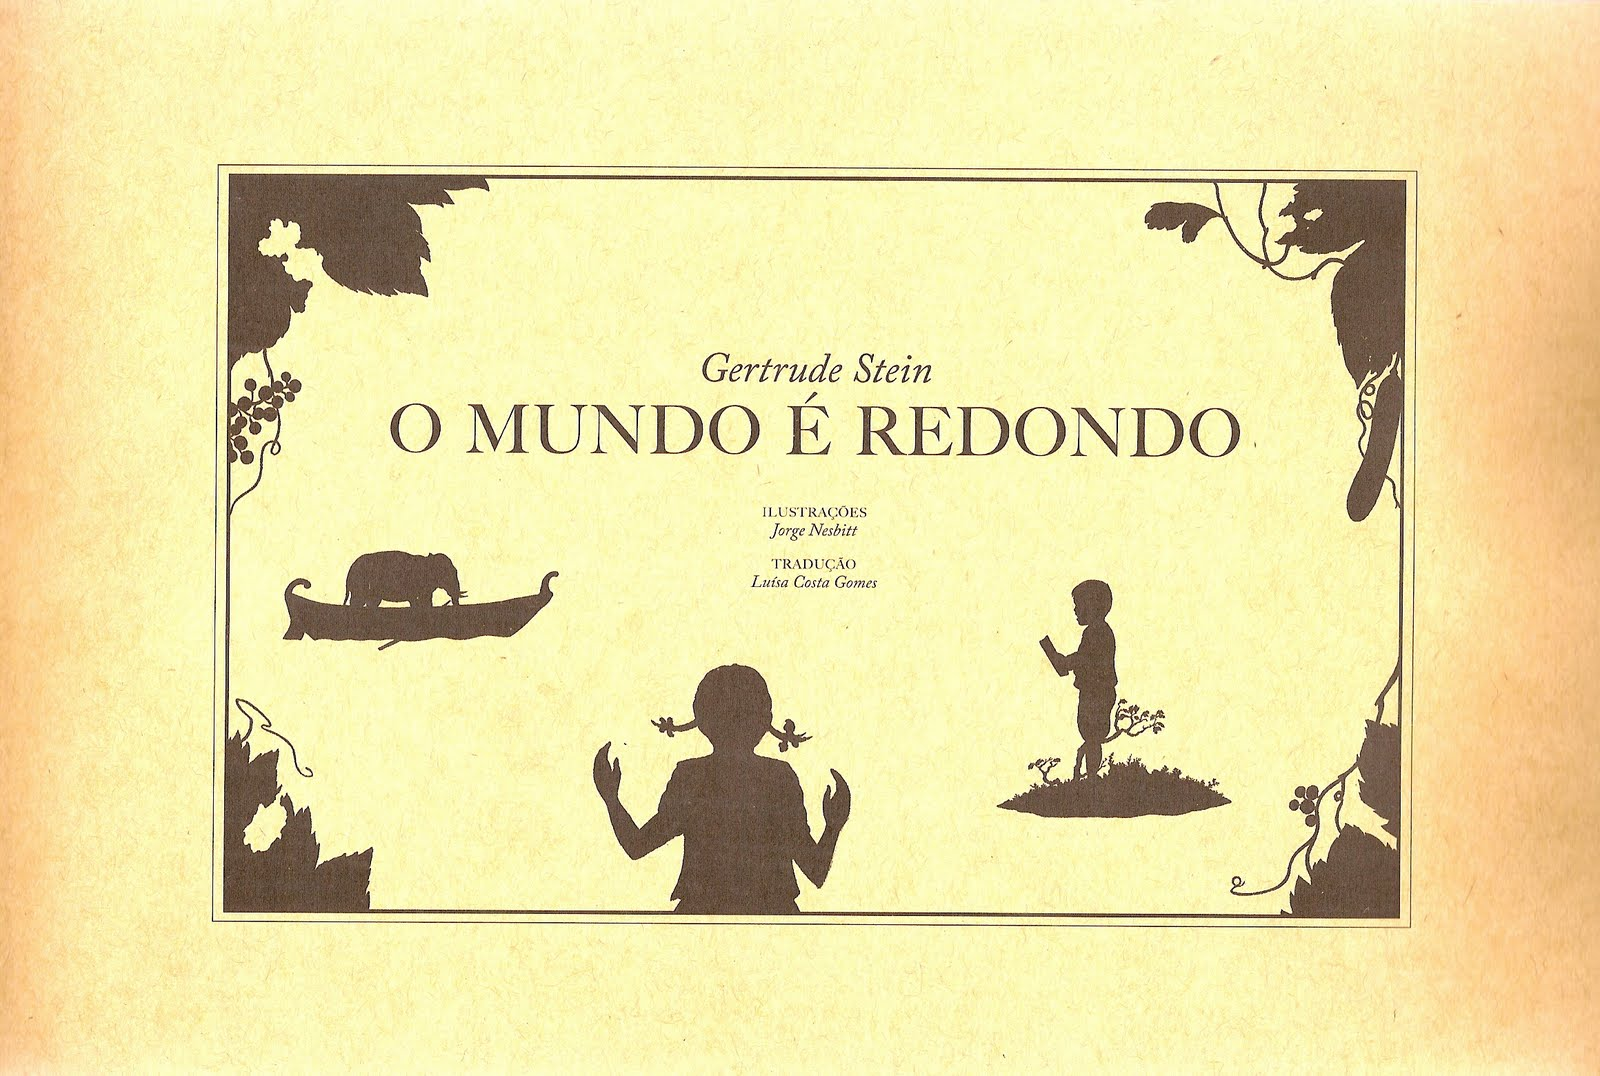 O mundo é redondo, de Gertrude Stein - livros infantis obscuros